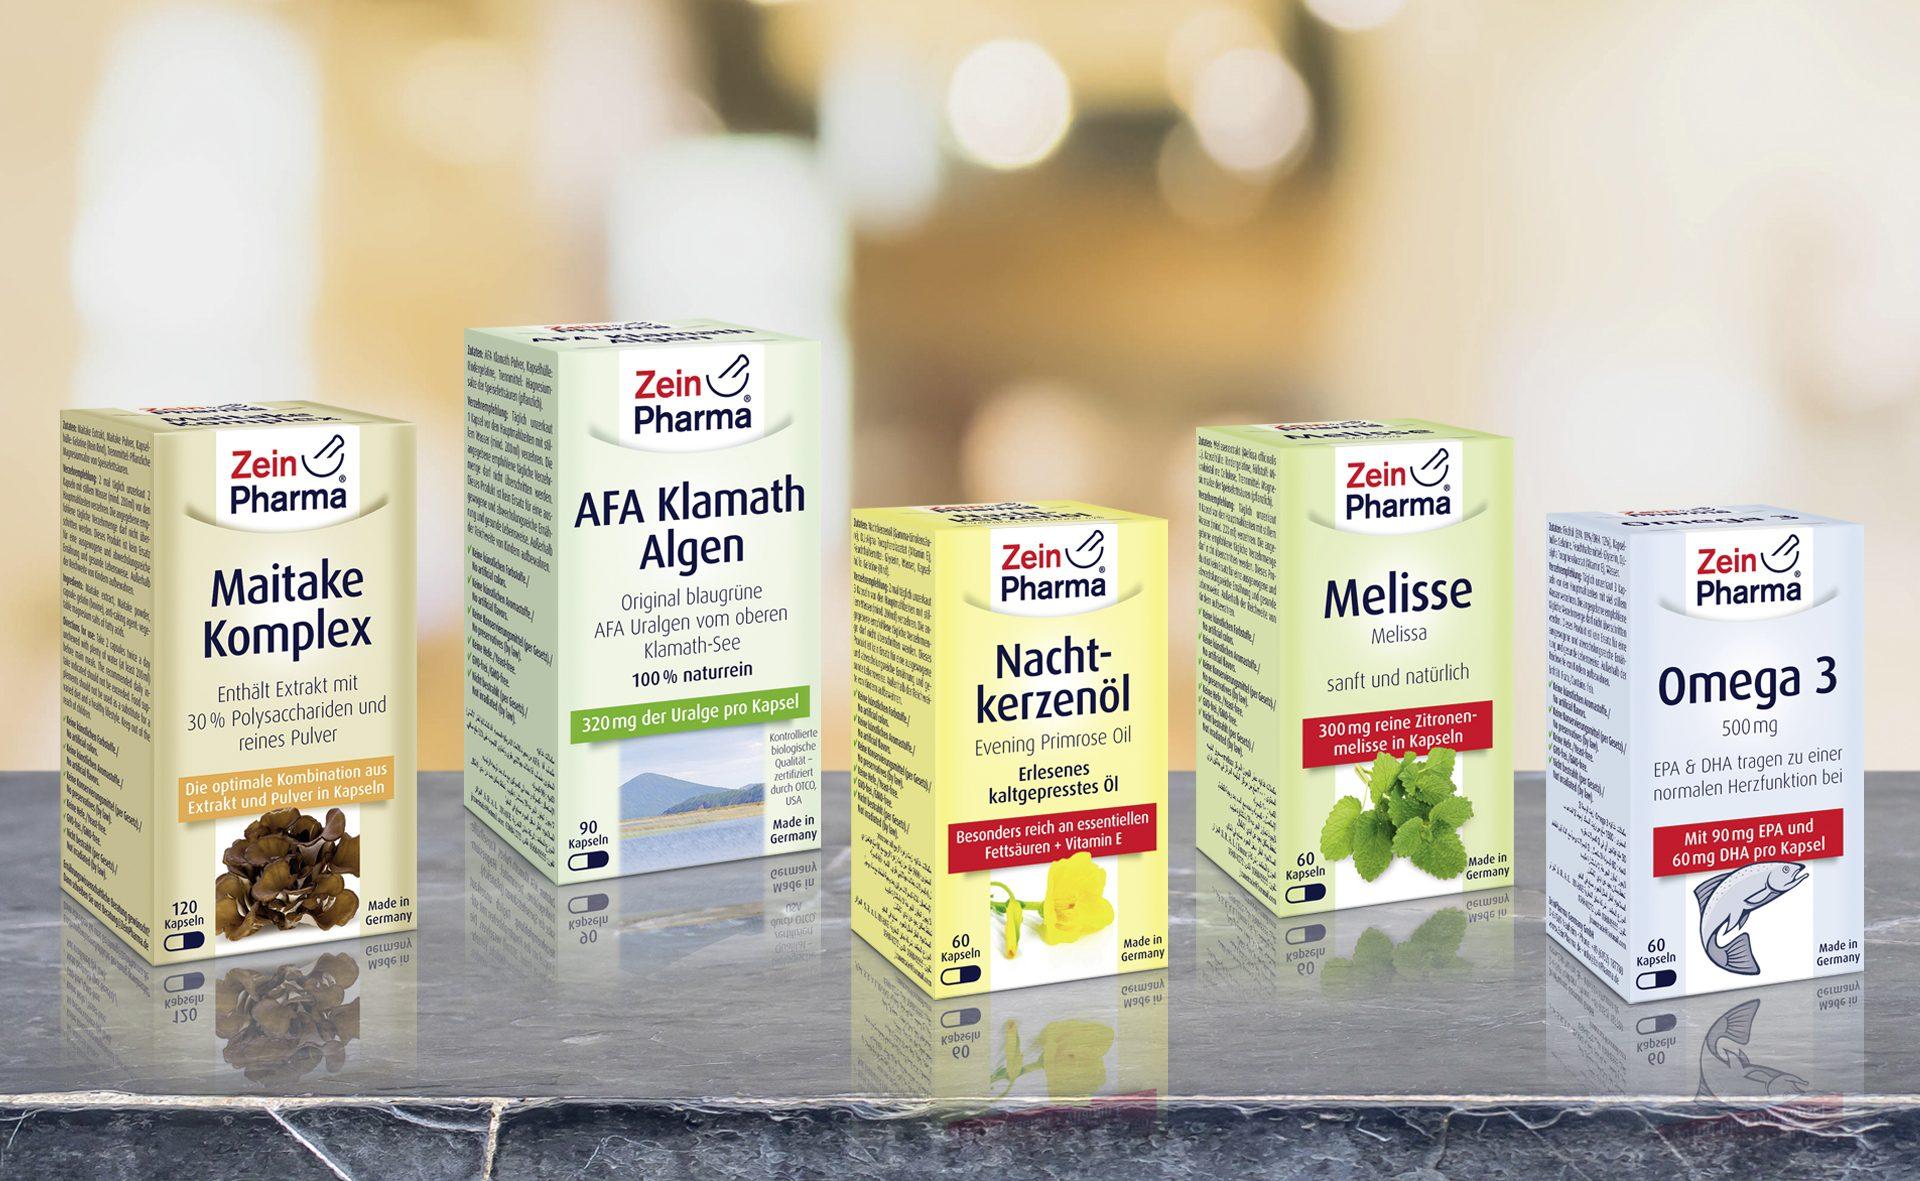 Verpackungsdesign Malvega - Referenz: Zein Pharma